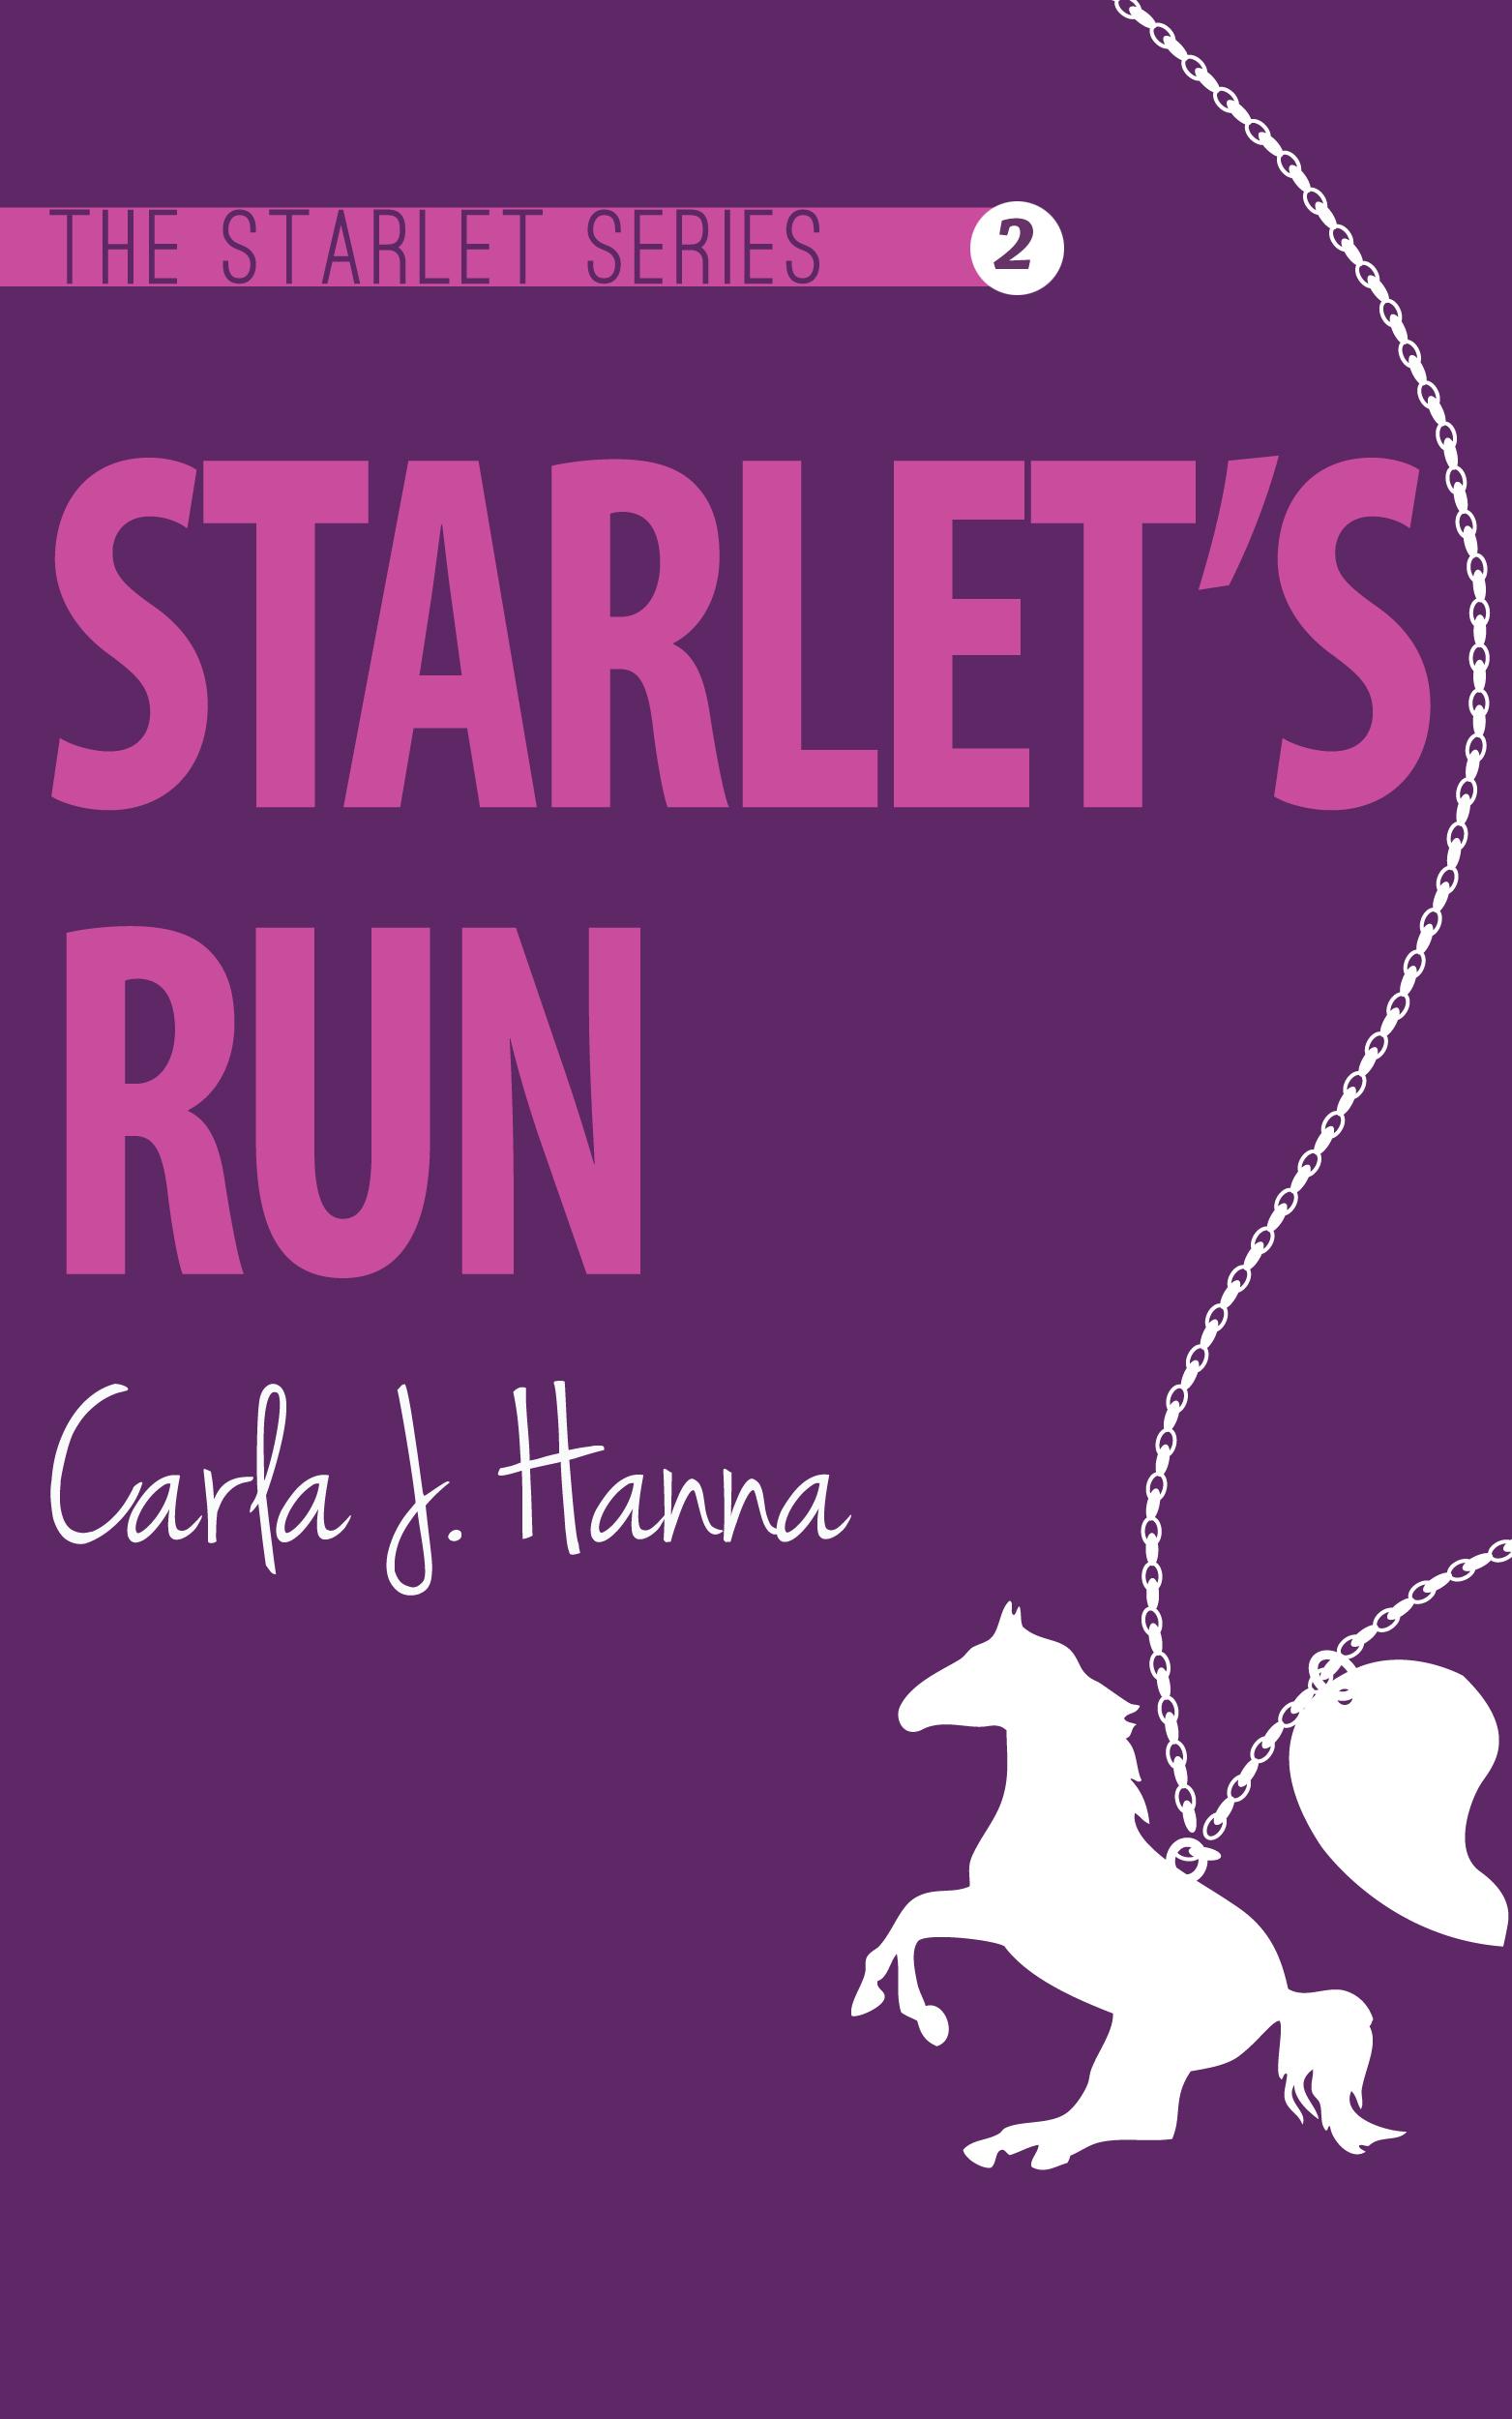 Carla J. Hanna - Starlet's Run (The Starlet Series, #2)